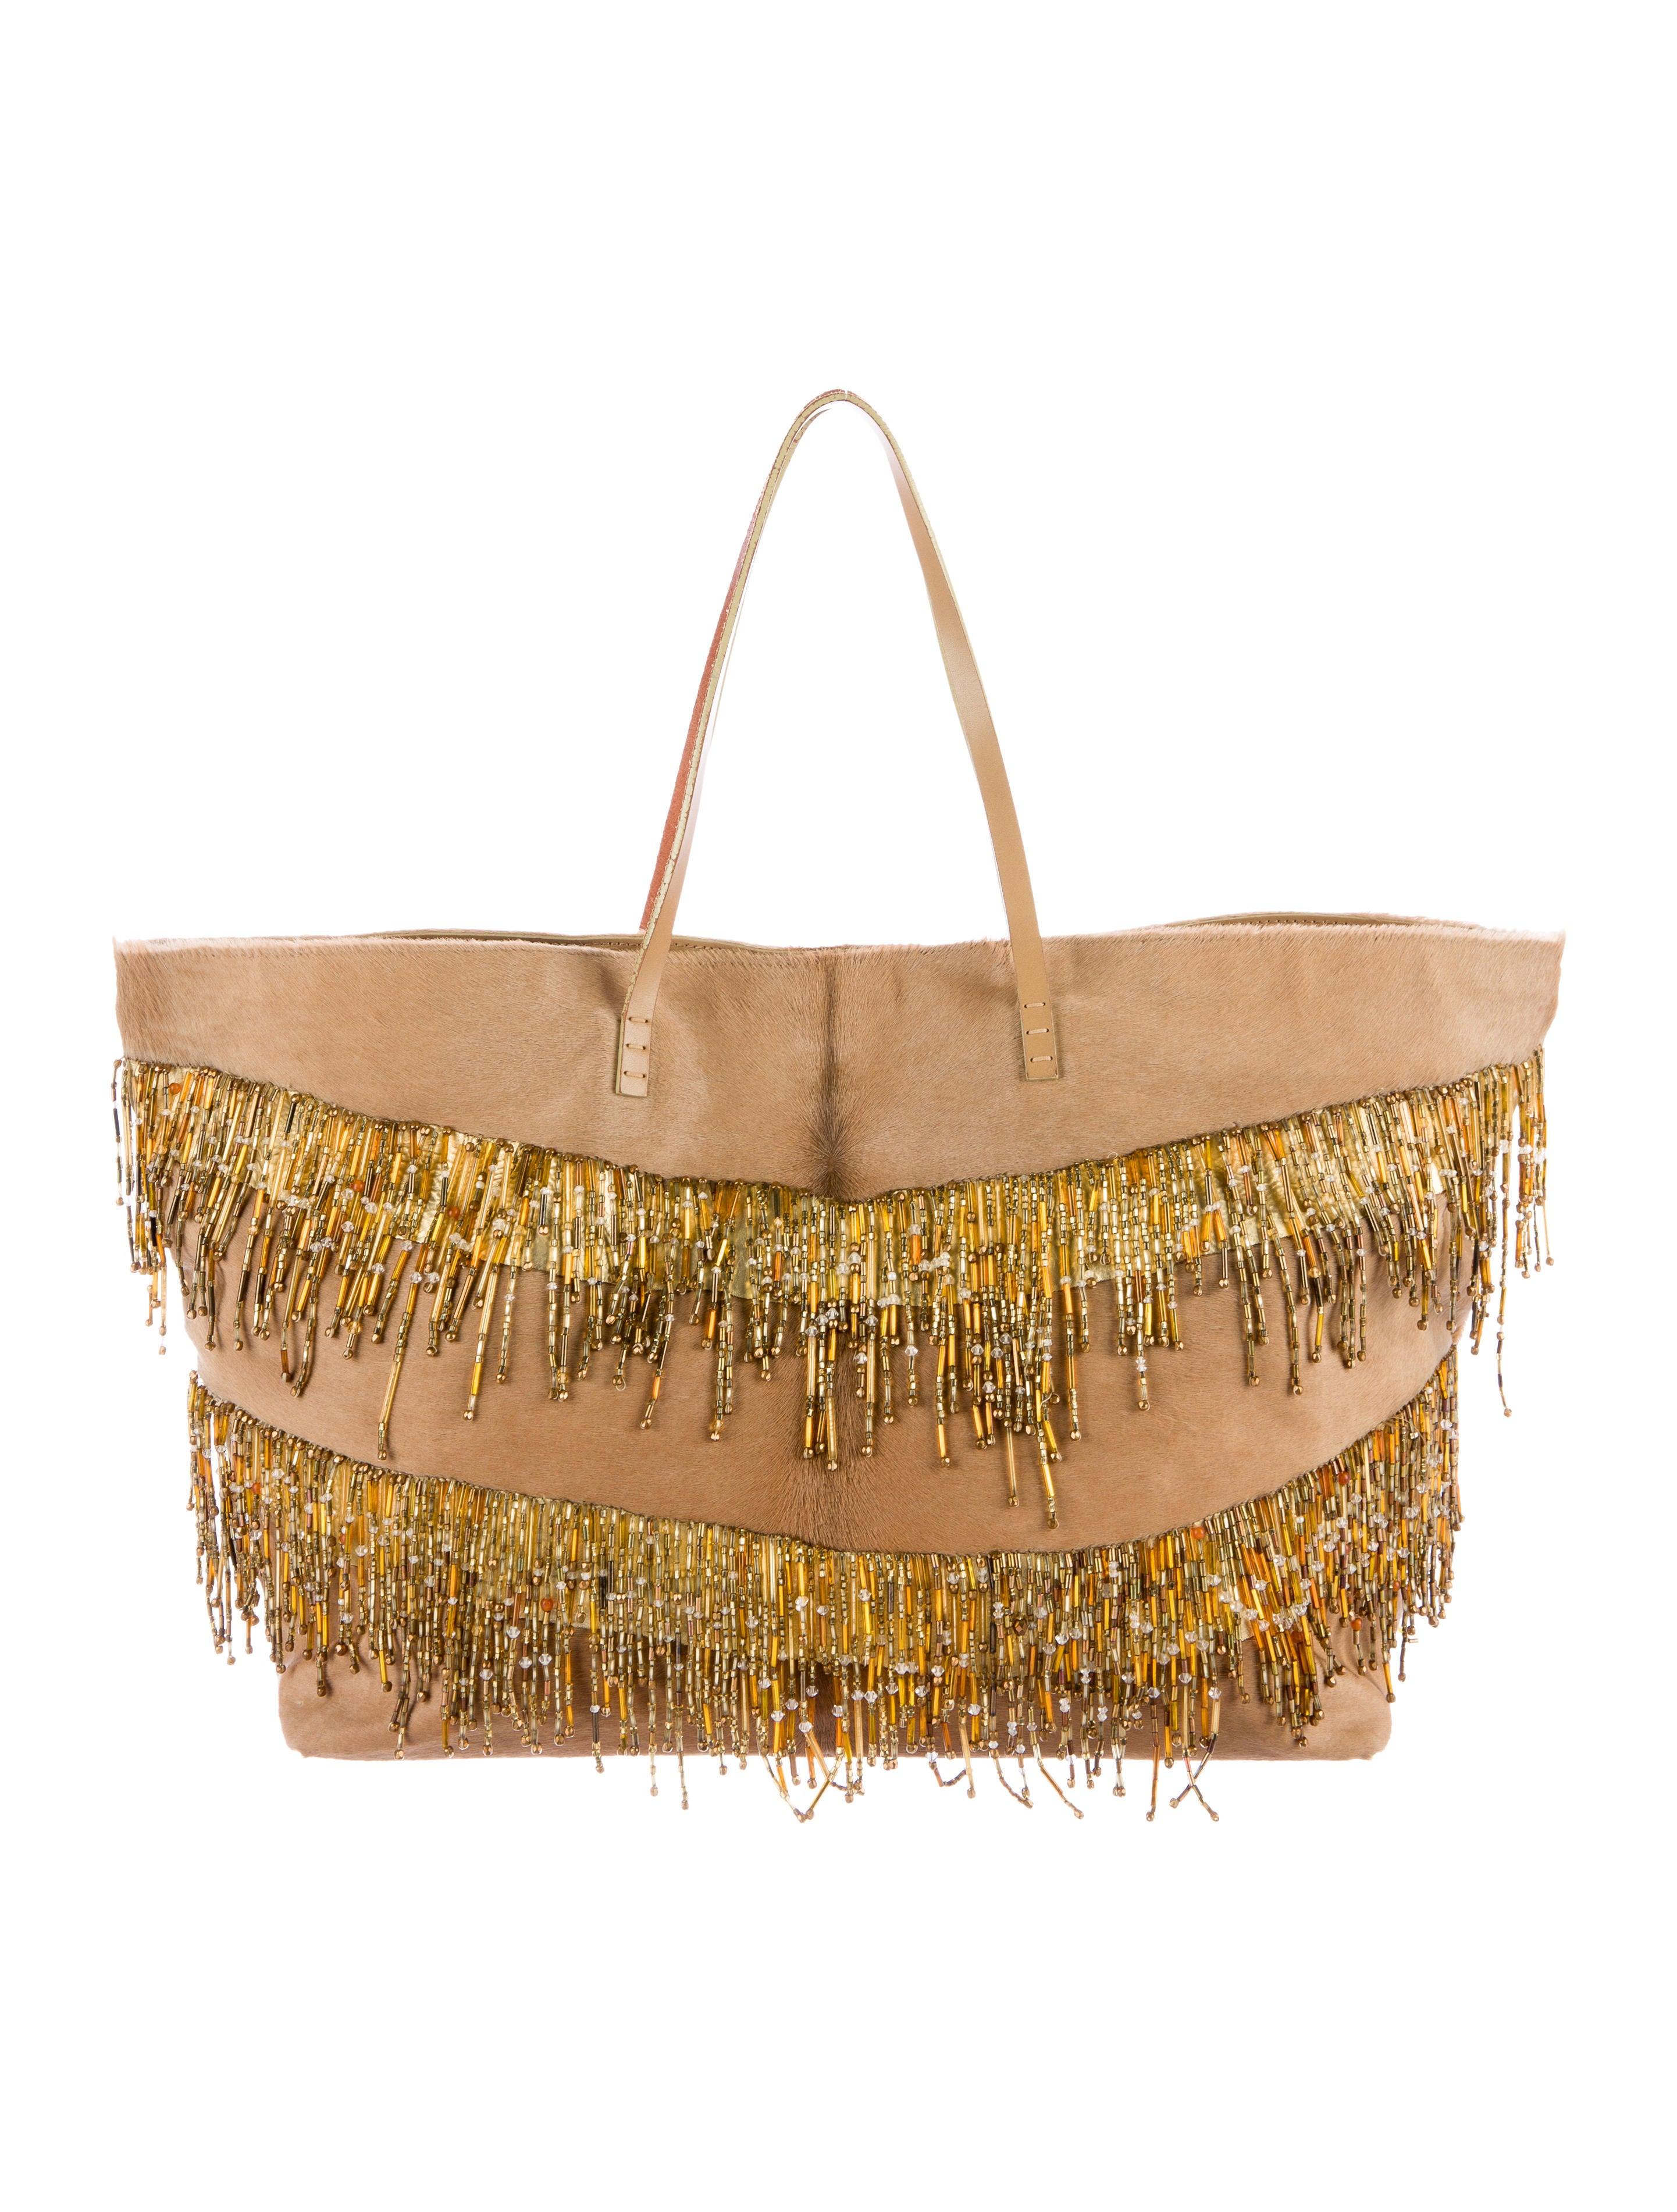 Fendi Beaded Ponyhair Matrioska Tote - Handbags - FEN57646  093166025c93d